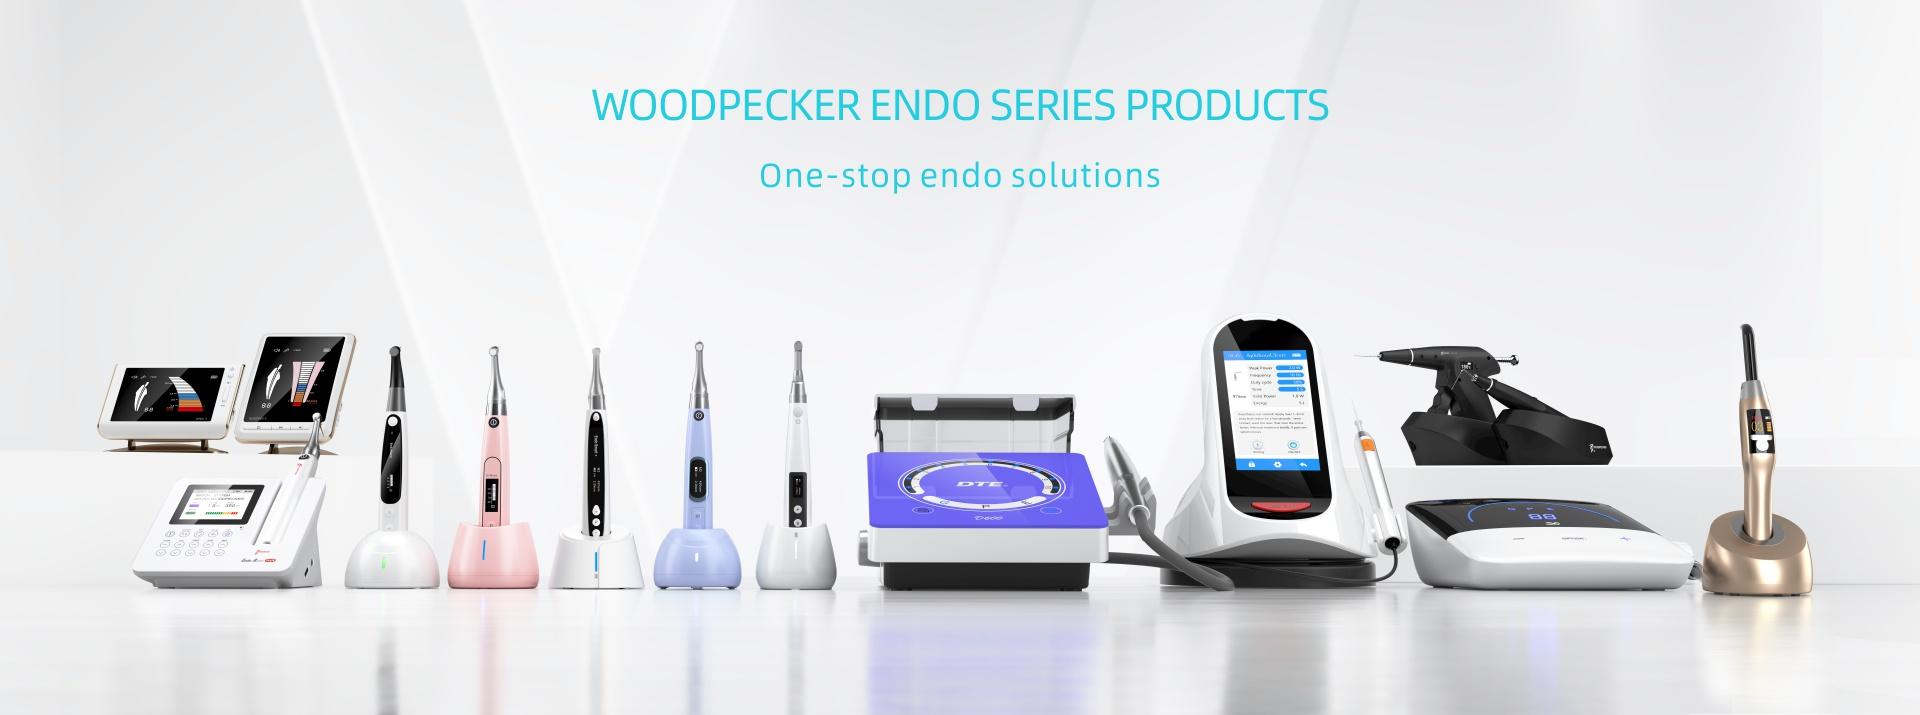 Woodpecker Endo Summit 2021